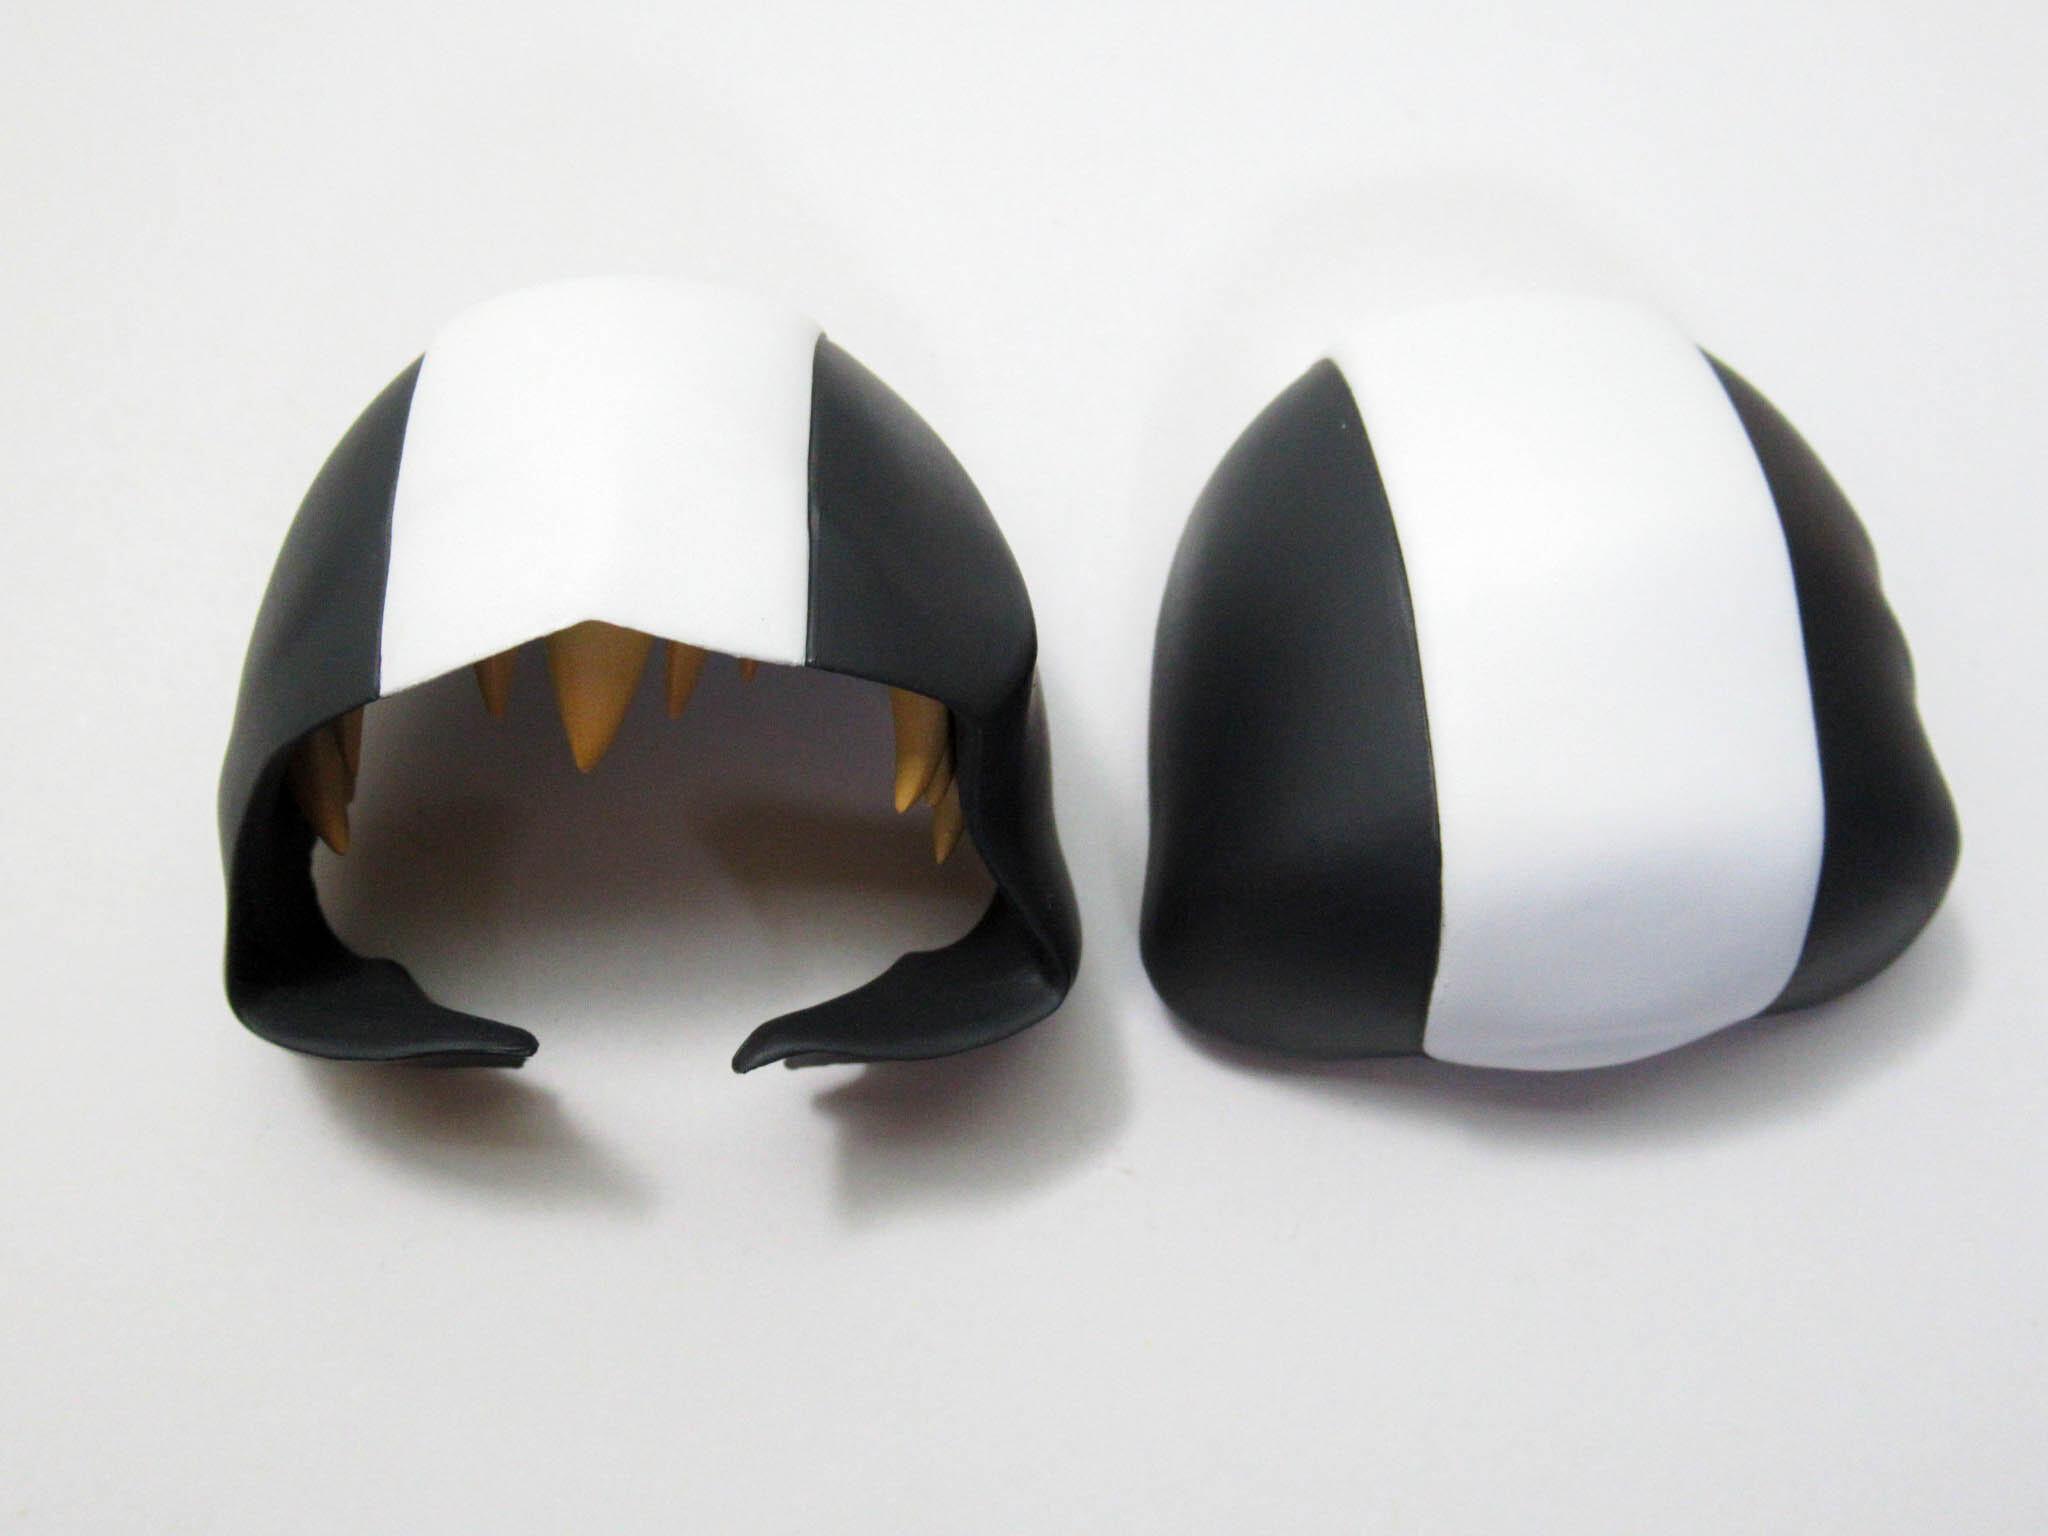 【842DX】 セイバー(プロトタイプ)霊基再臨 Ver. 髪パーツ フード付きショート ねんどろいど